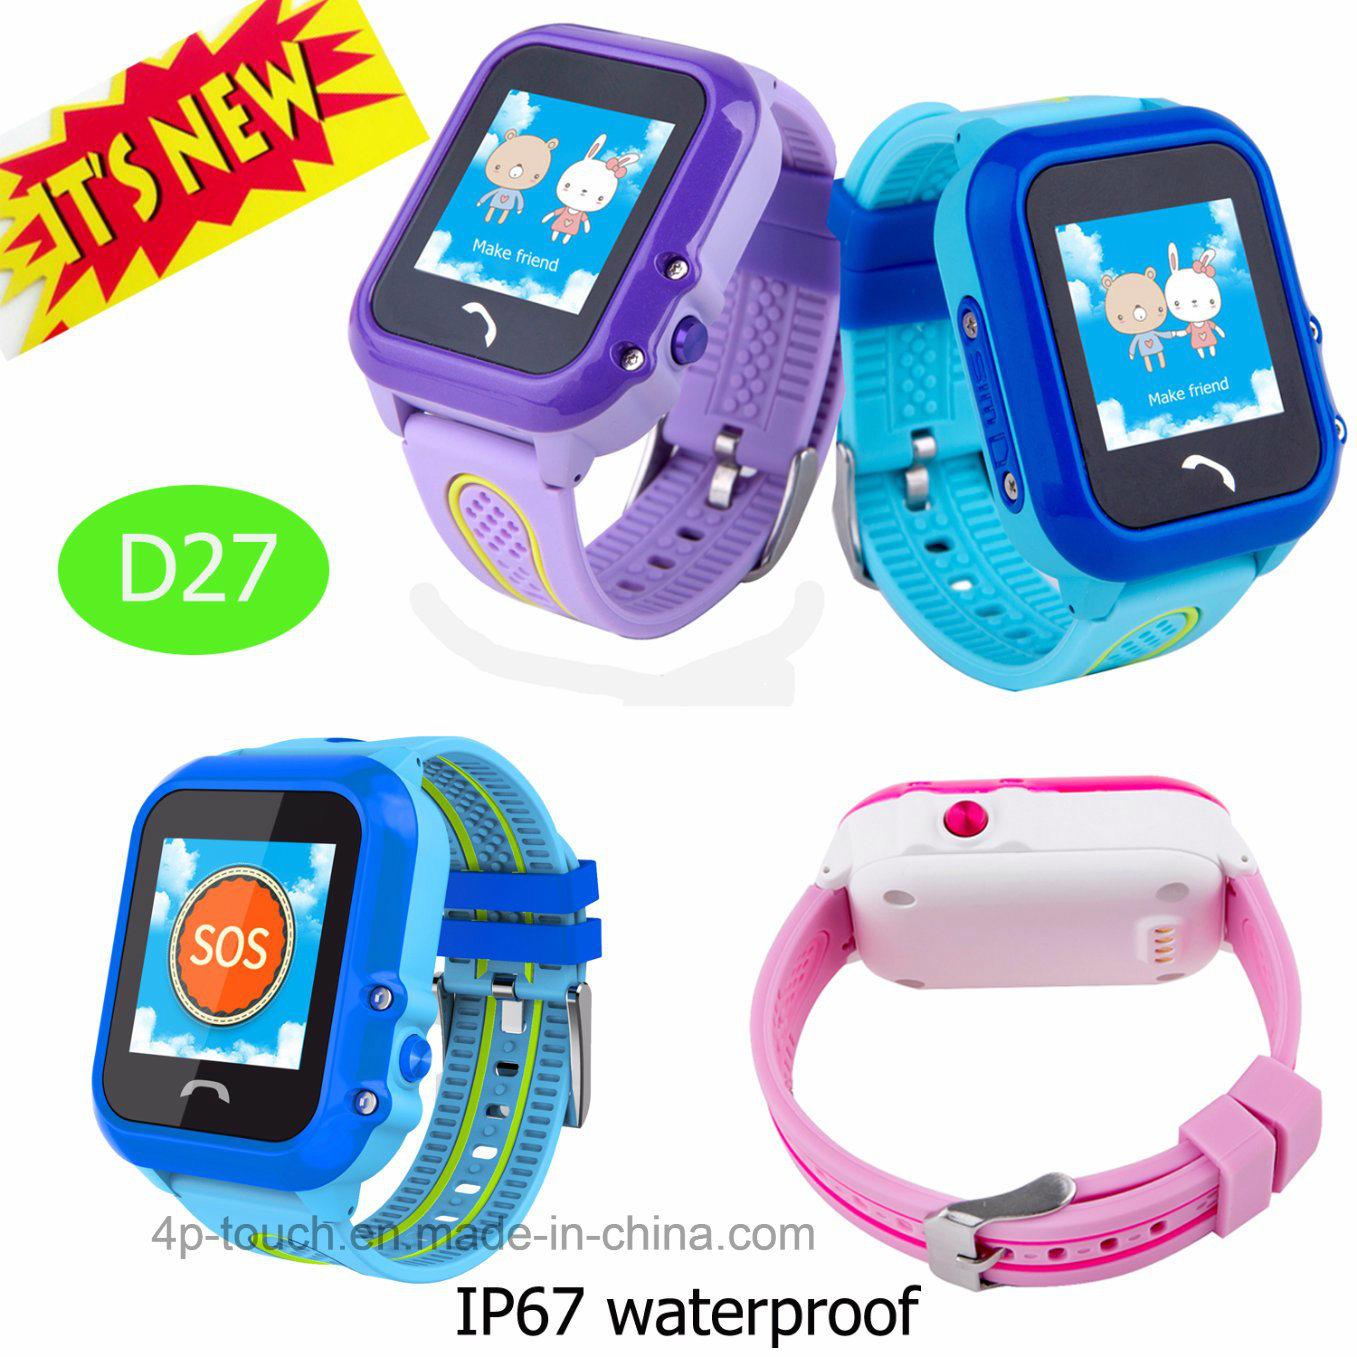 IP67 Waterproof Kids GPS Tracker Watch with Sos Button (D27)